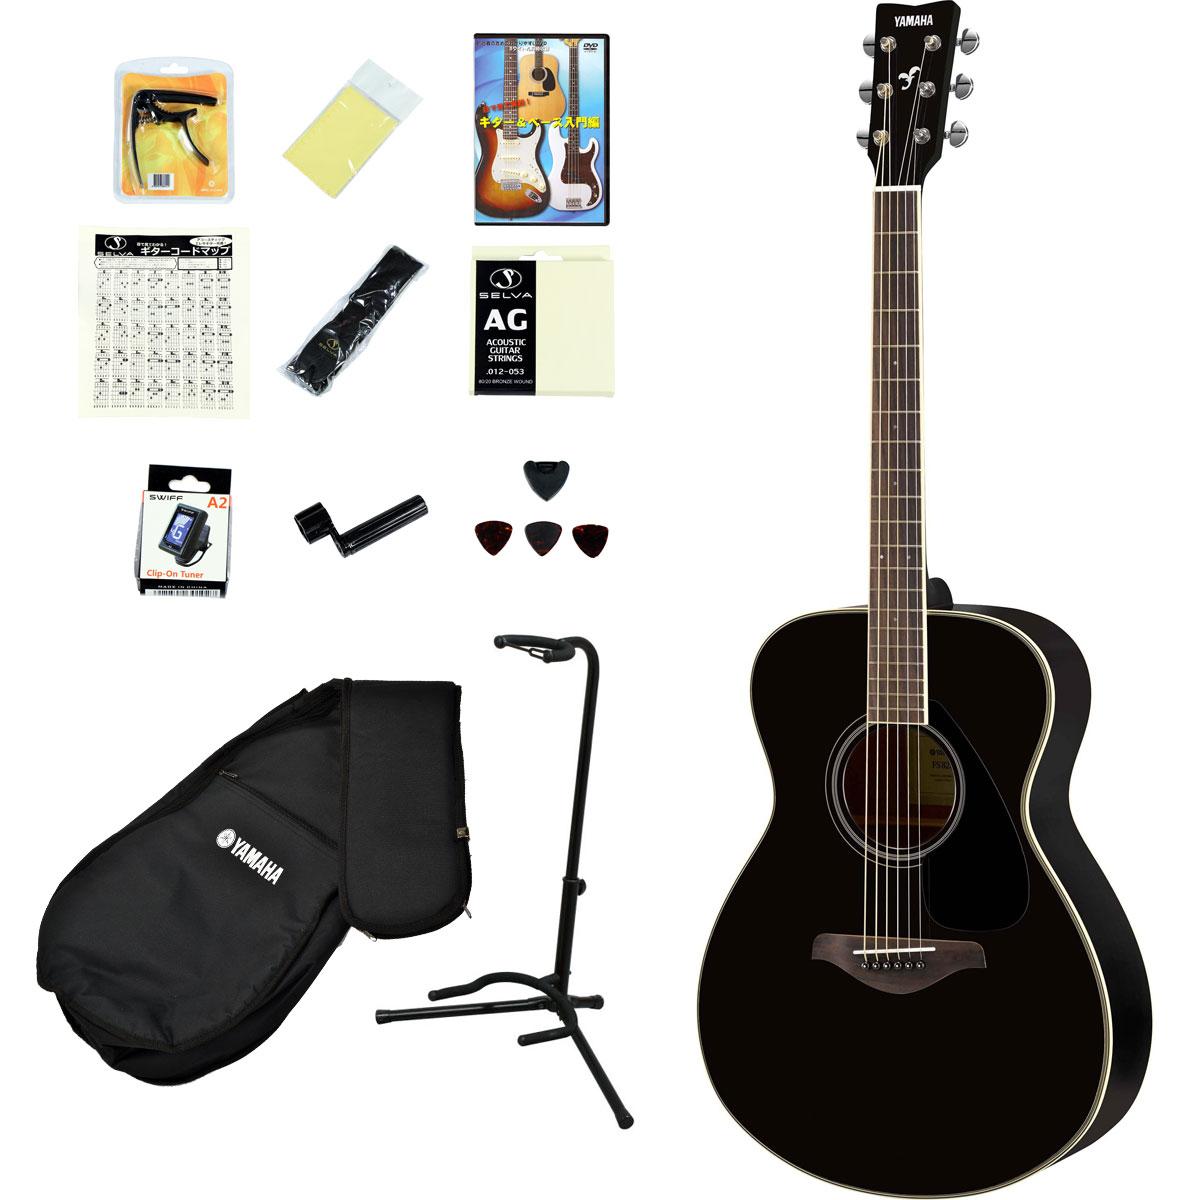 YAMAHA / FS820 BL(ブラック) 【アコースティックギター14点入門セット!】 ヤマハ フォークギター アコギ FS-820 入門 初心者【YRK】